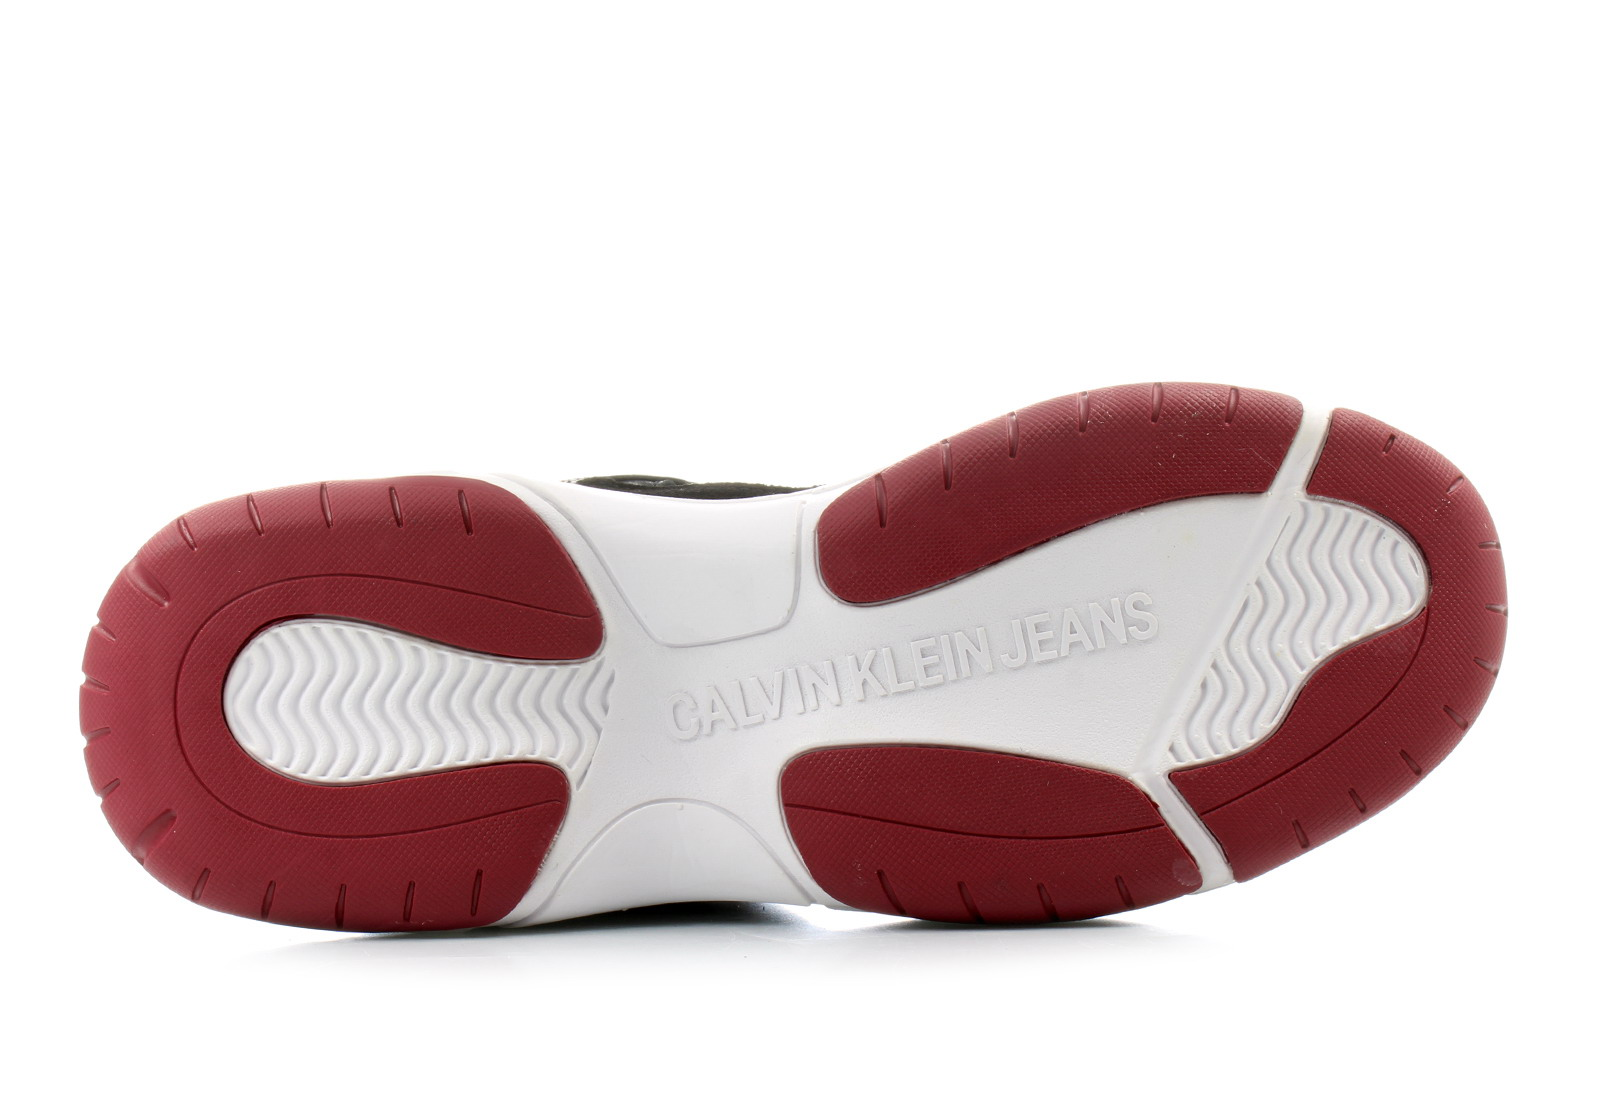 Calvin Klein Jeans Cipő - Marvin - S1770-BLK - Office Shoes Magyarország 021215669a